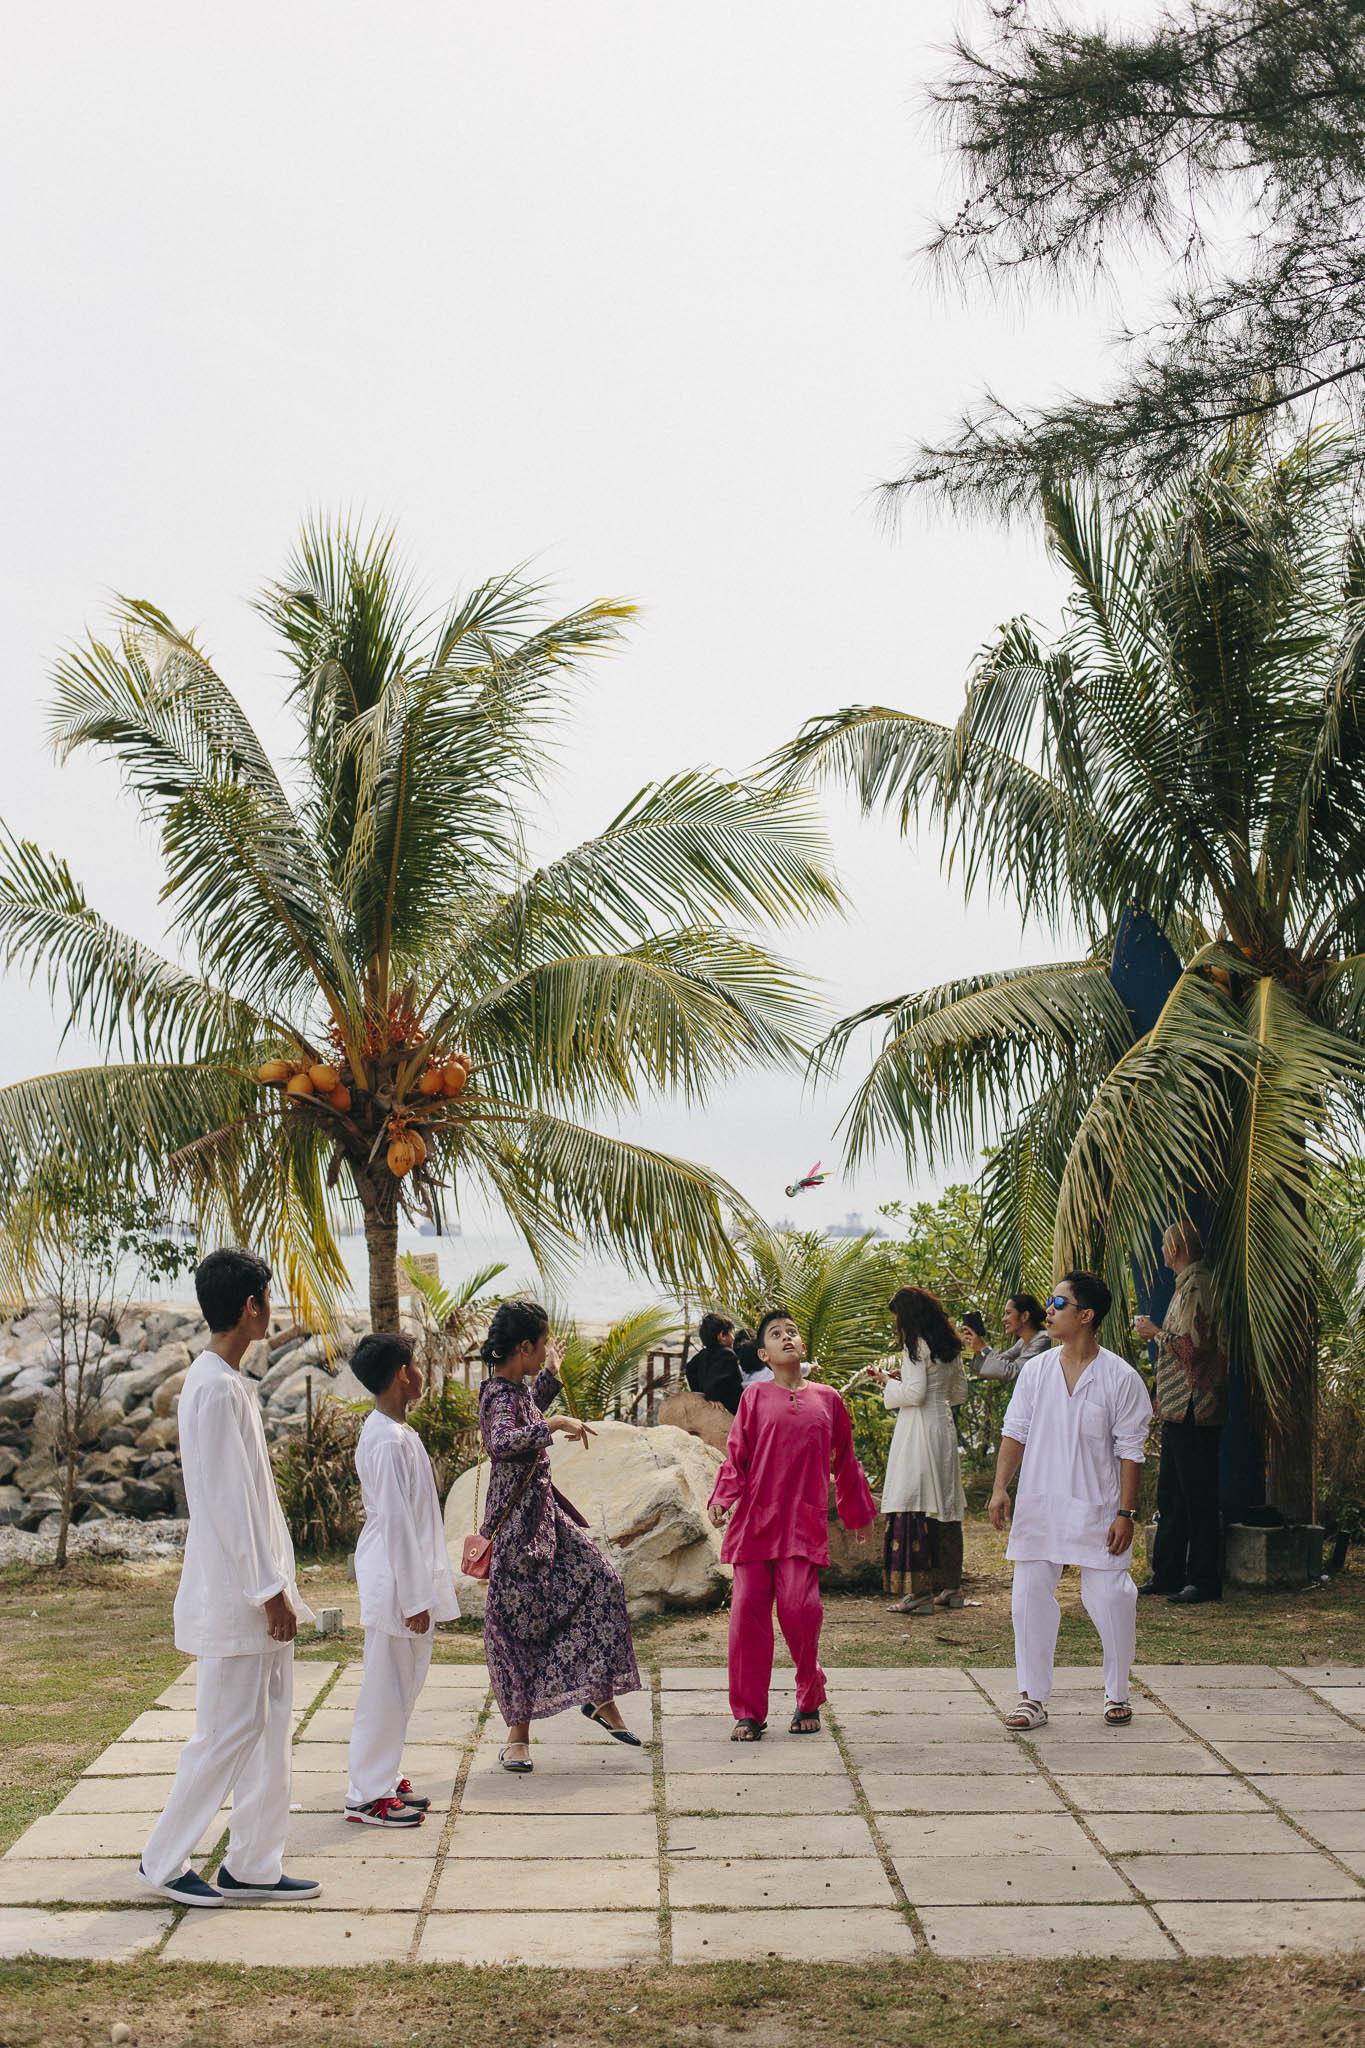 singapore-wedding-photographer-travel-khairul-atikah-52.jpg